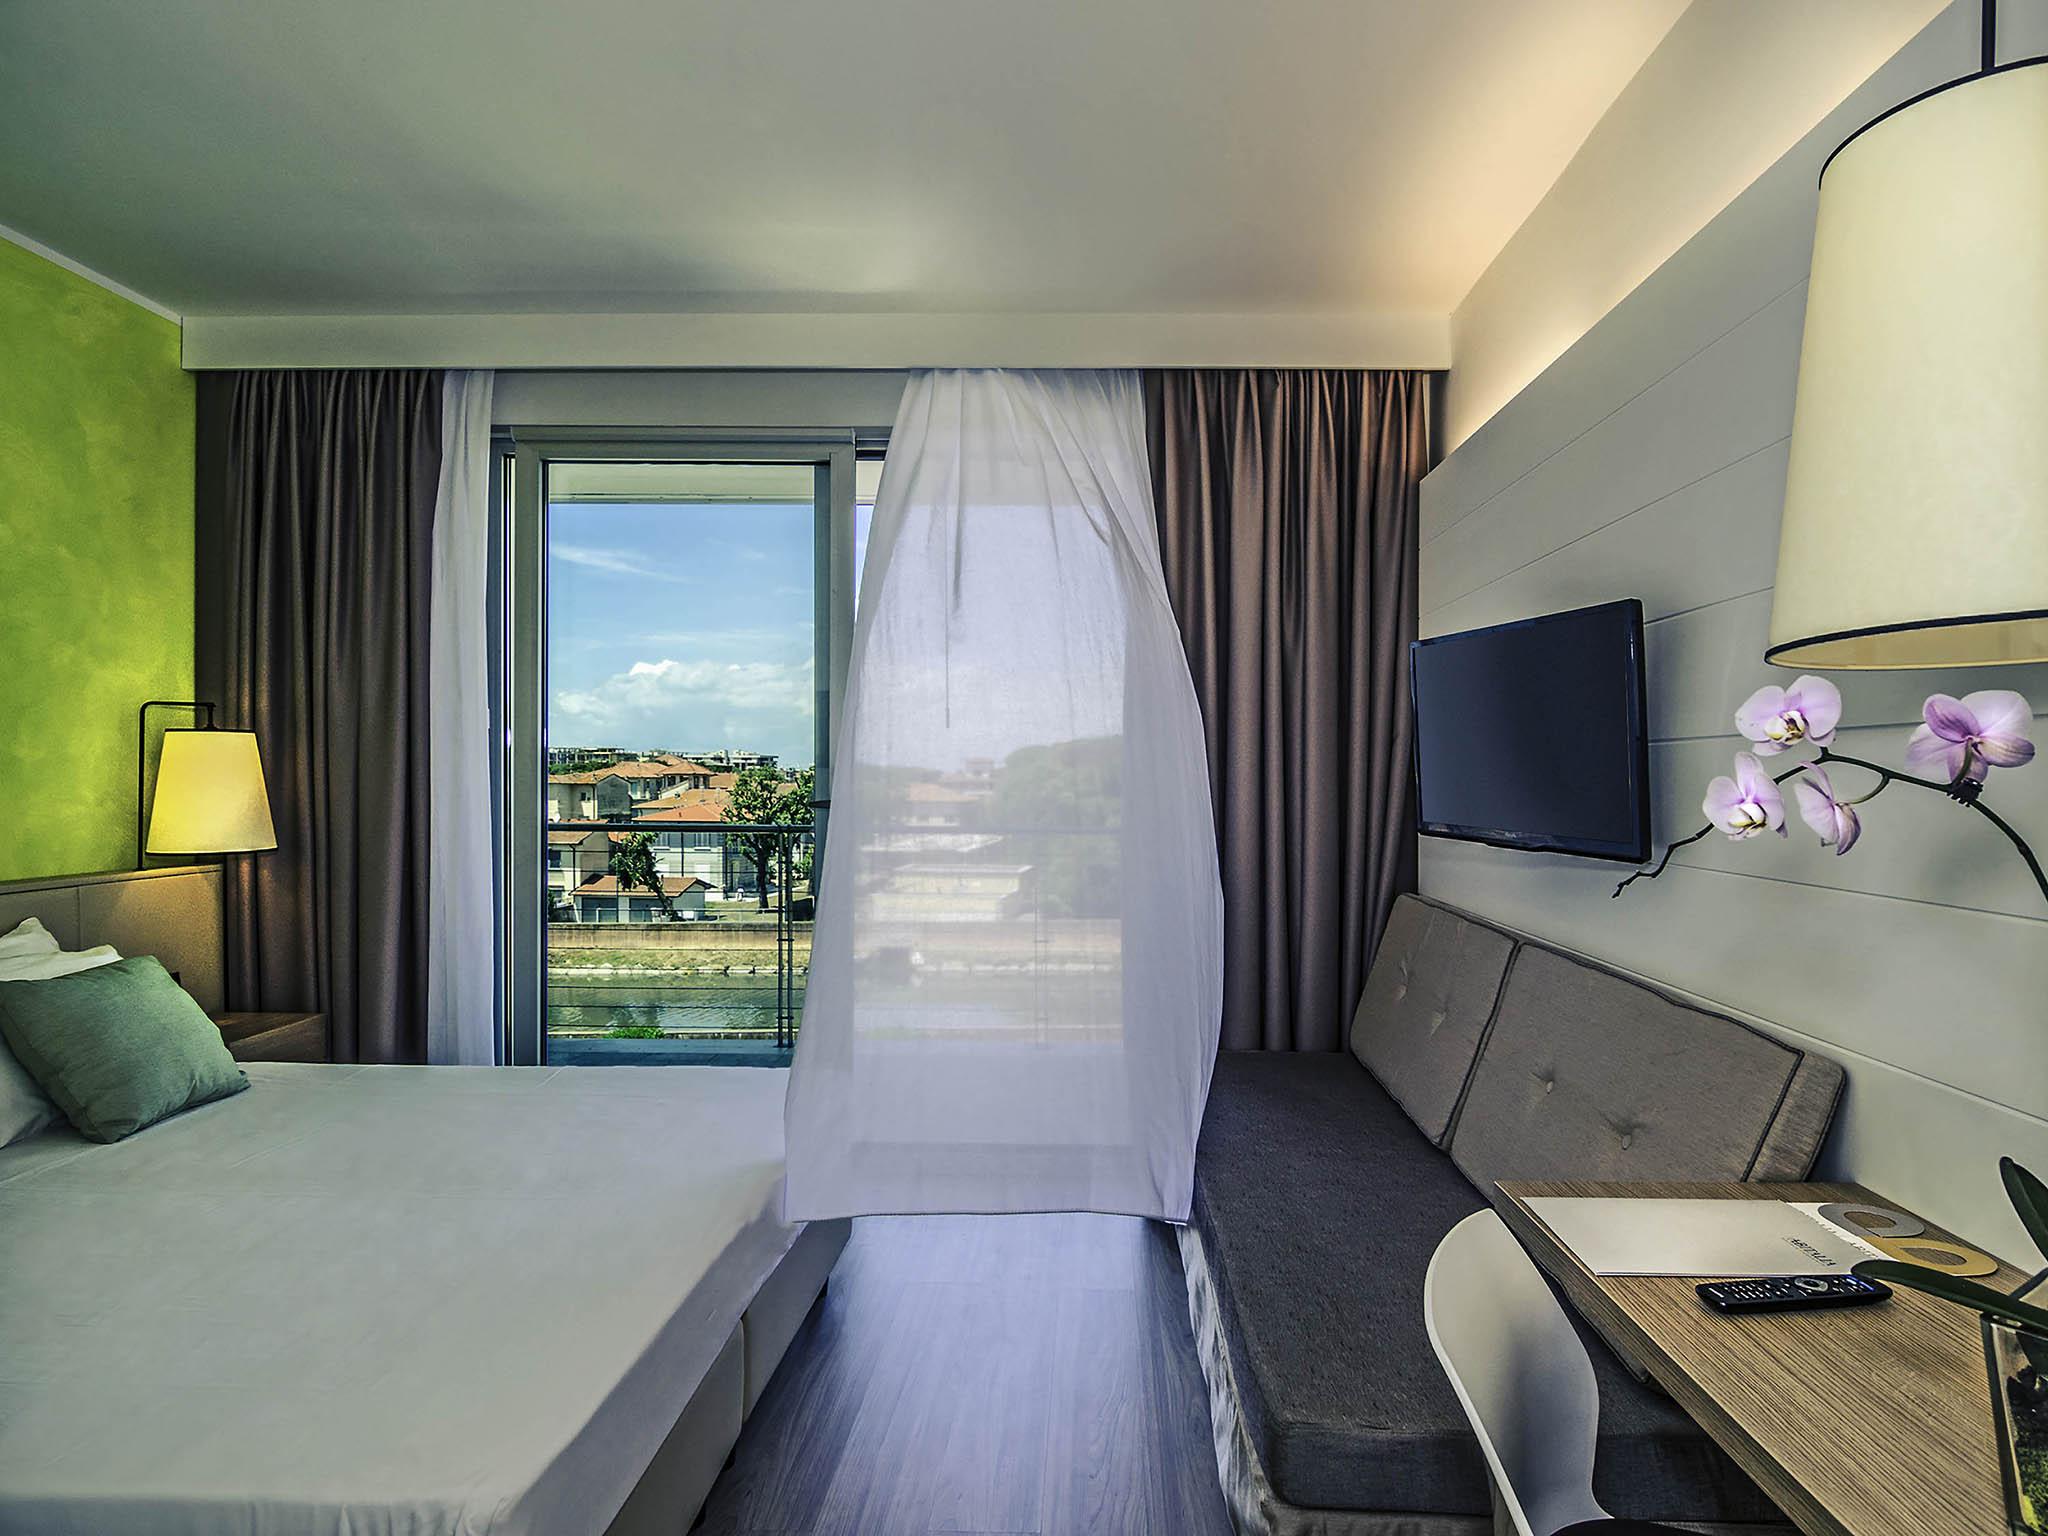 Viareggio Hotel Apartments